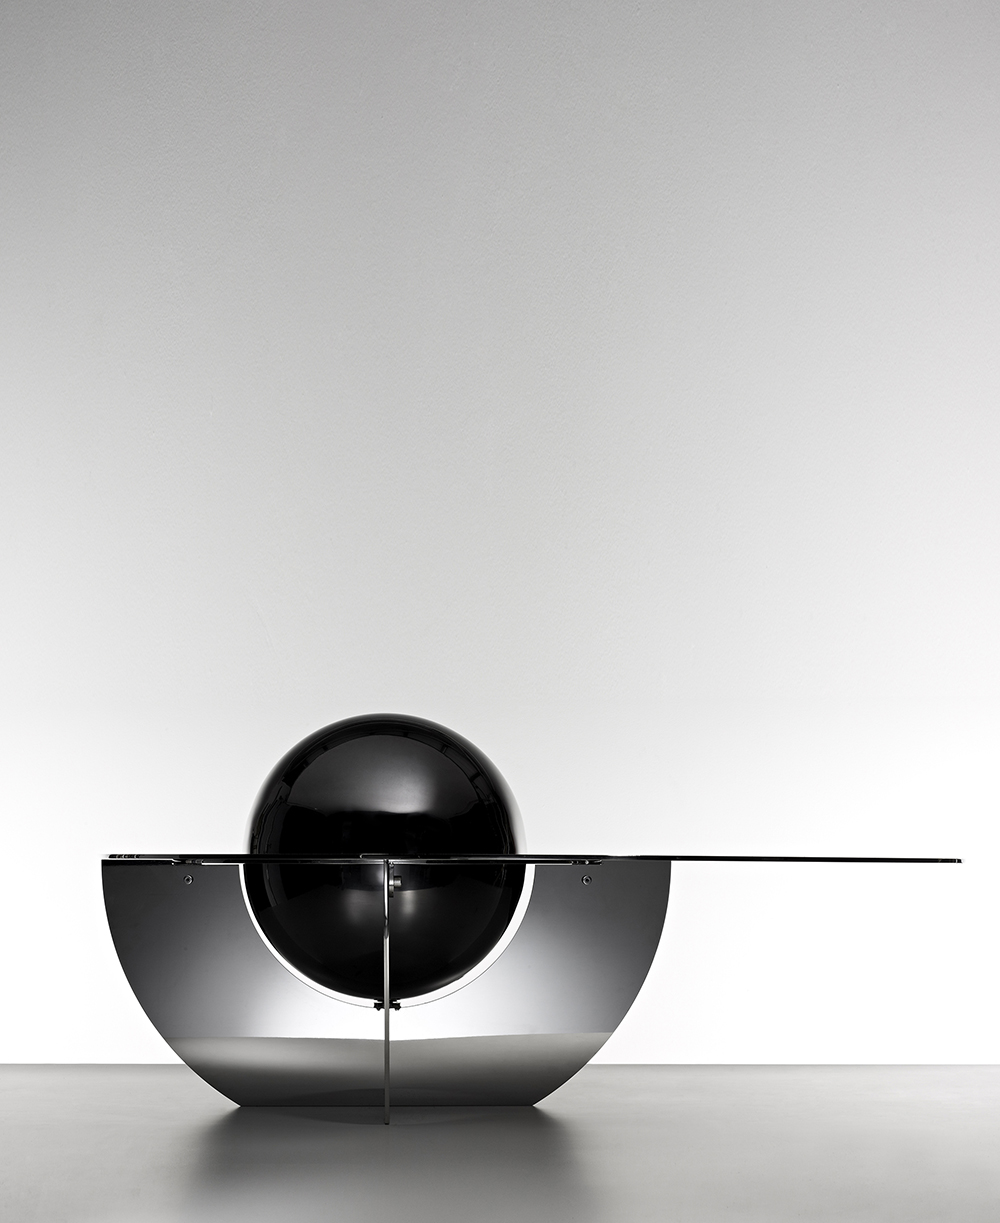 Brooksbank&Collins_Boullee_Image 3_Black Sphere